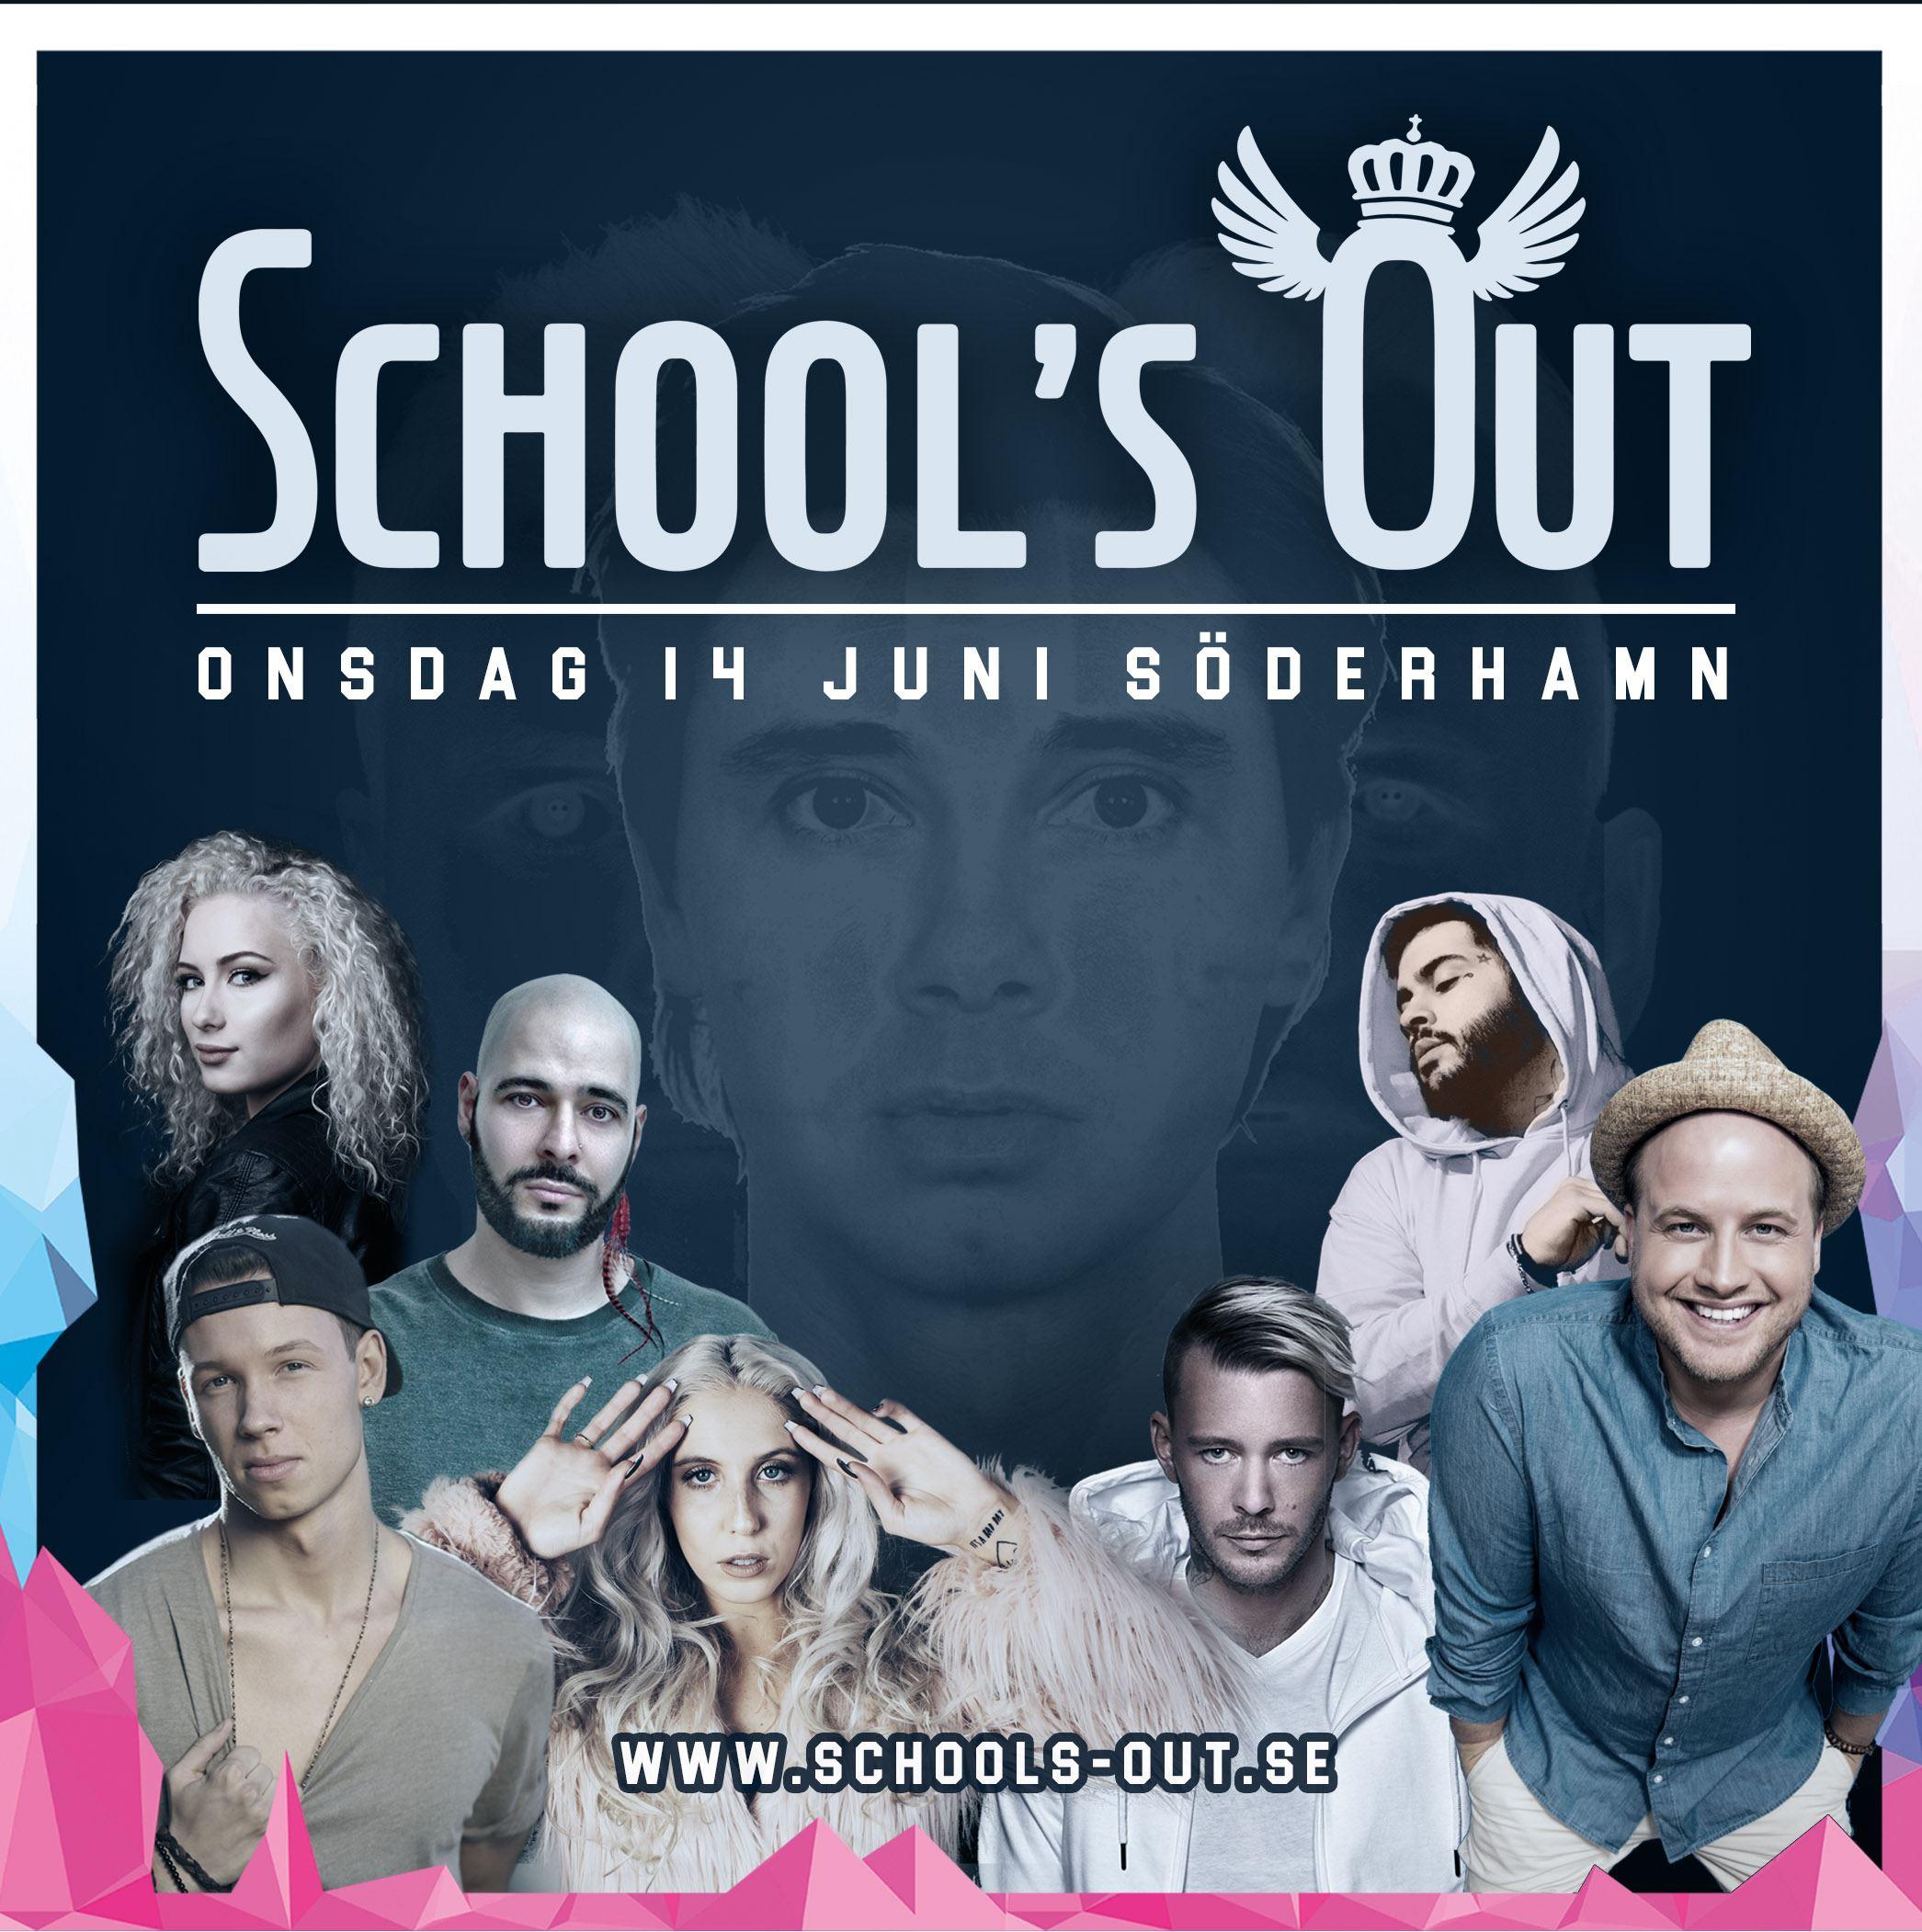 Schools Out 2017 SEEB, Garmiani, Freddy Kalas, Joakim Lundell, Peg Parnevik, Wiktoria, Allyawan, Ben Mitkus